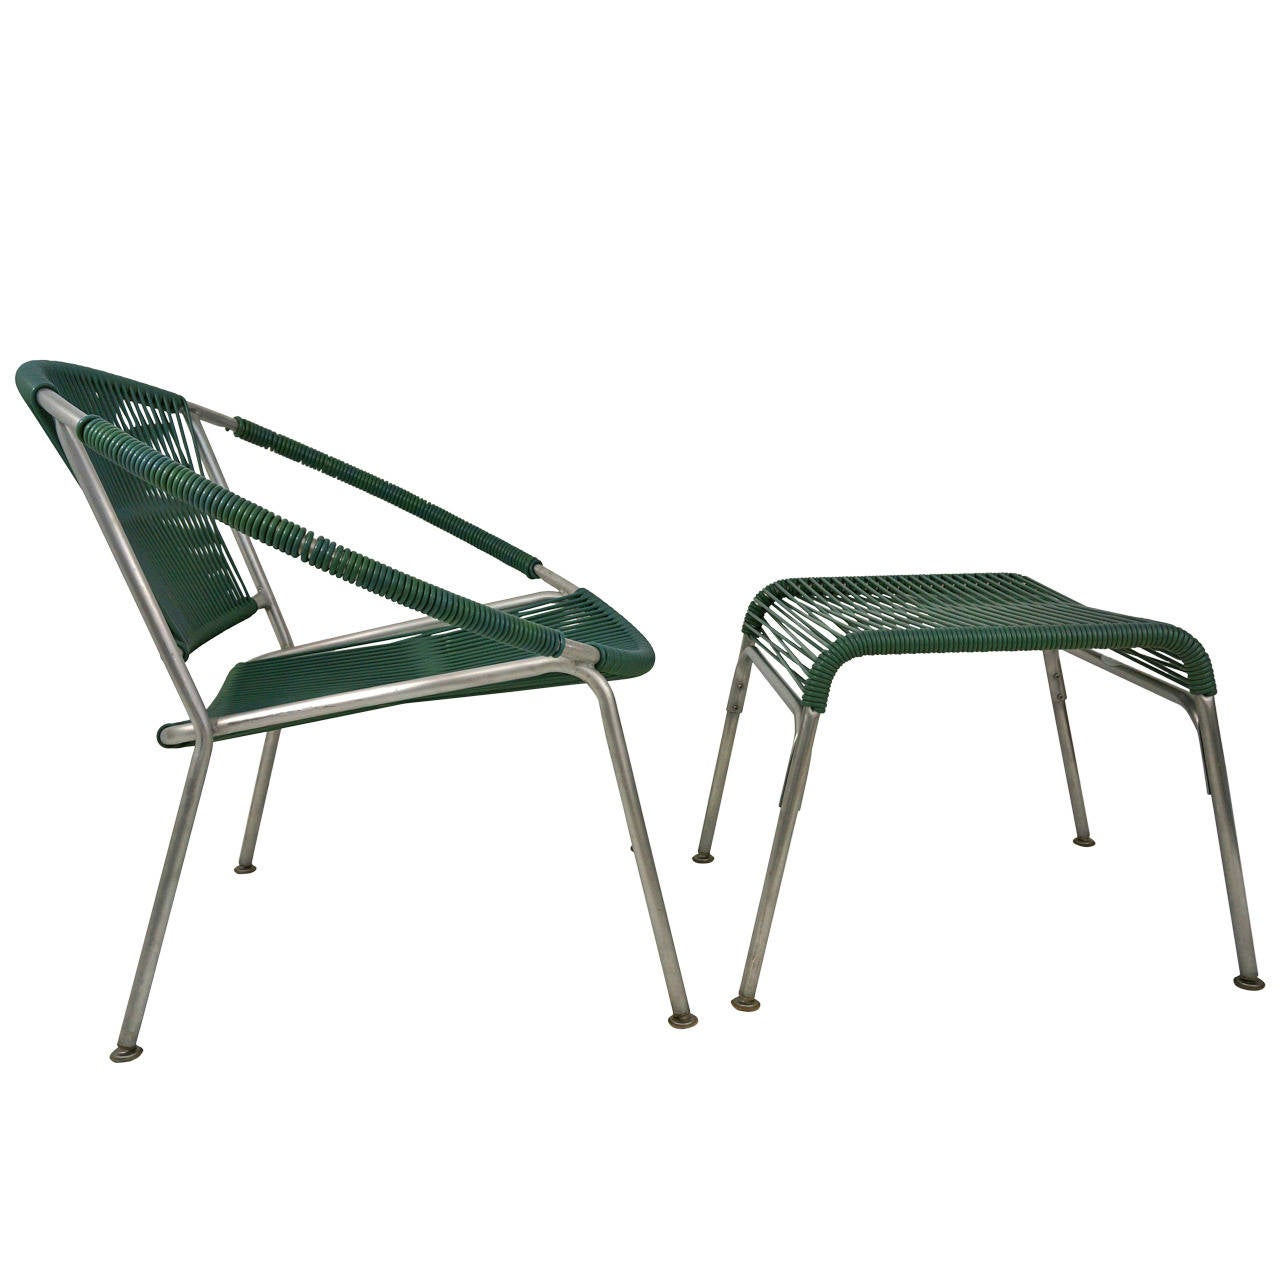 Century Patio Furniture : Vintage Mid Century Patio Furniture, Surf Line from the Brown Jordan ...